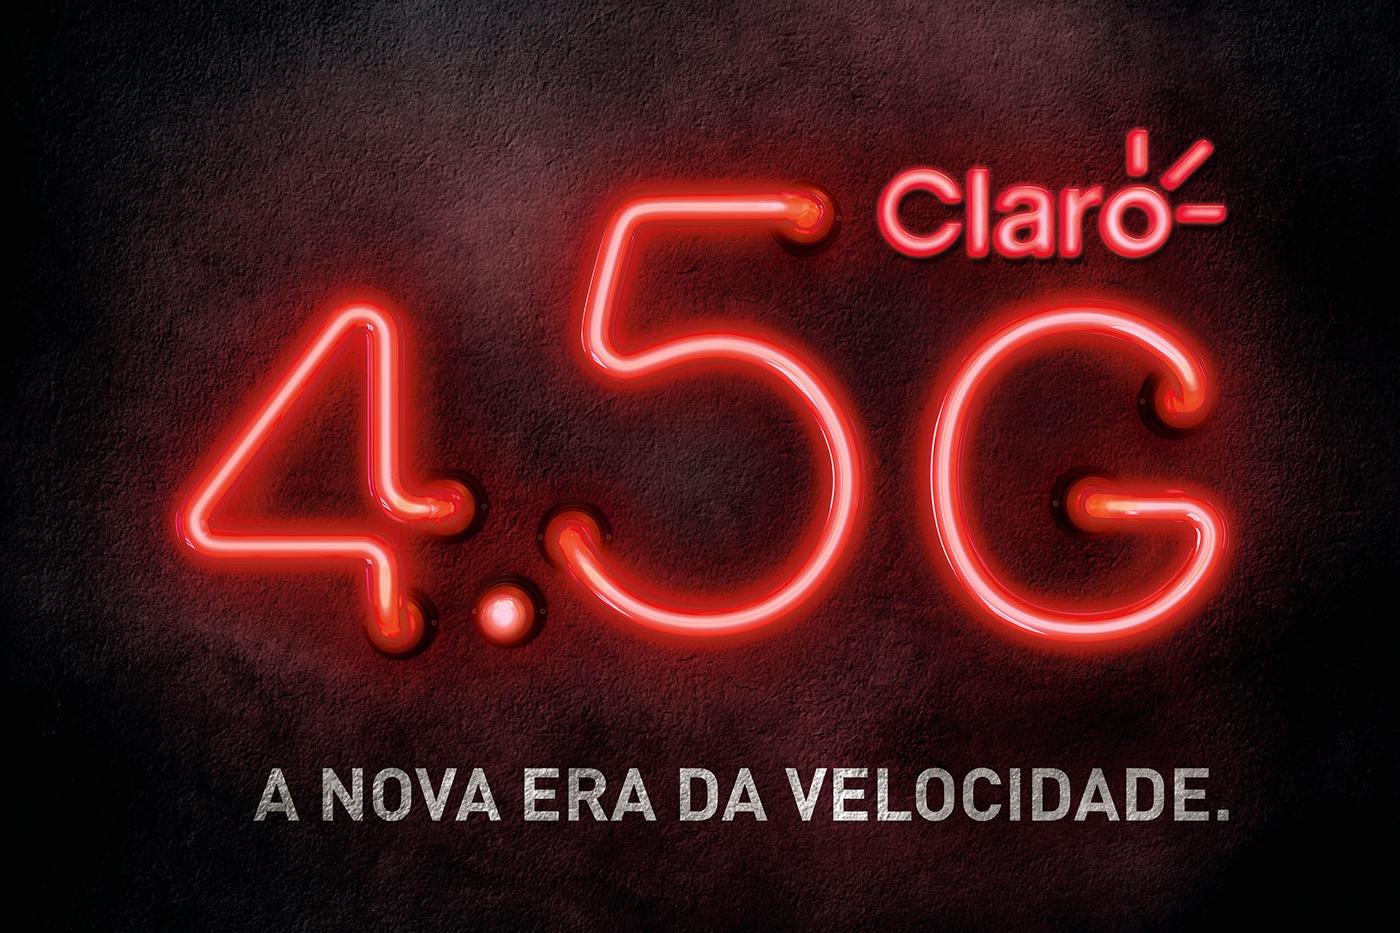 Imagem de Operadora Claro é criticada por logotipo enganoso de serviço 4.5G no tecmundo